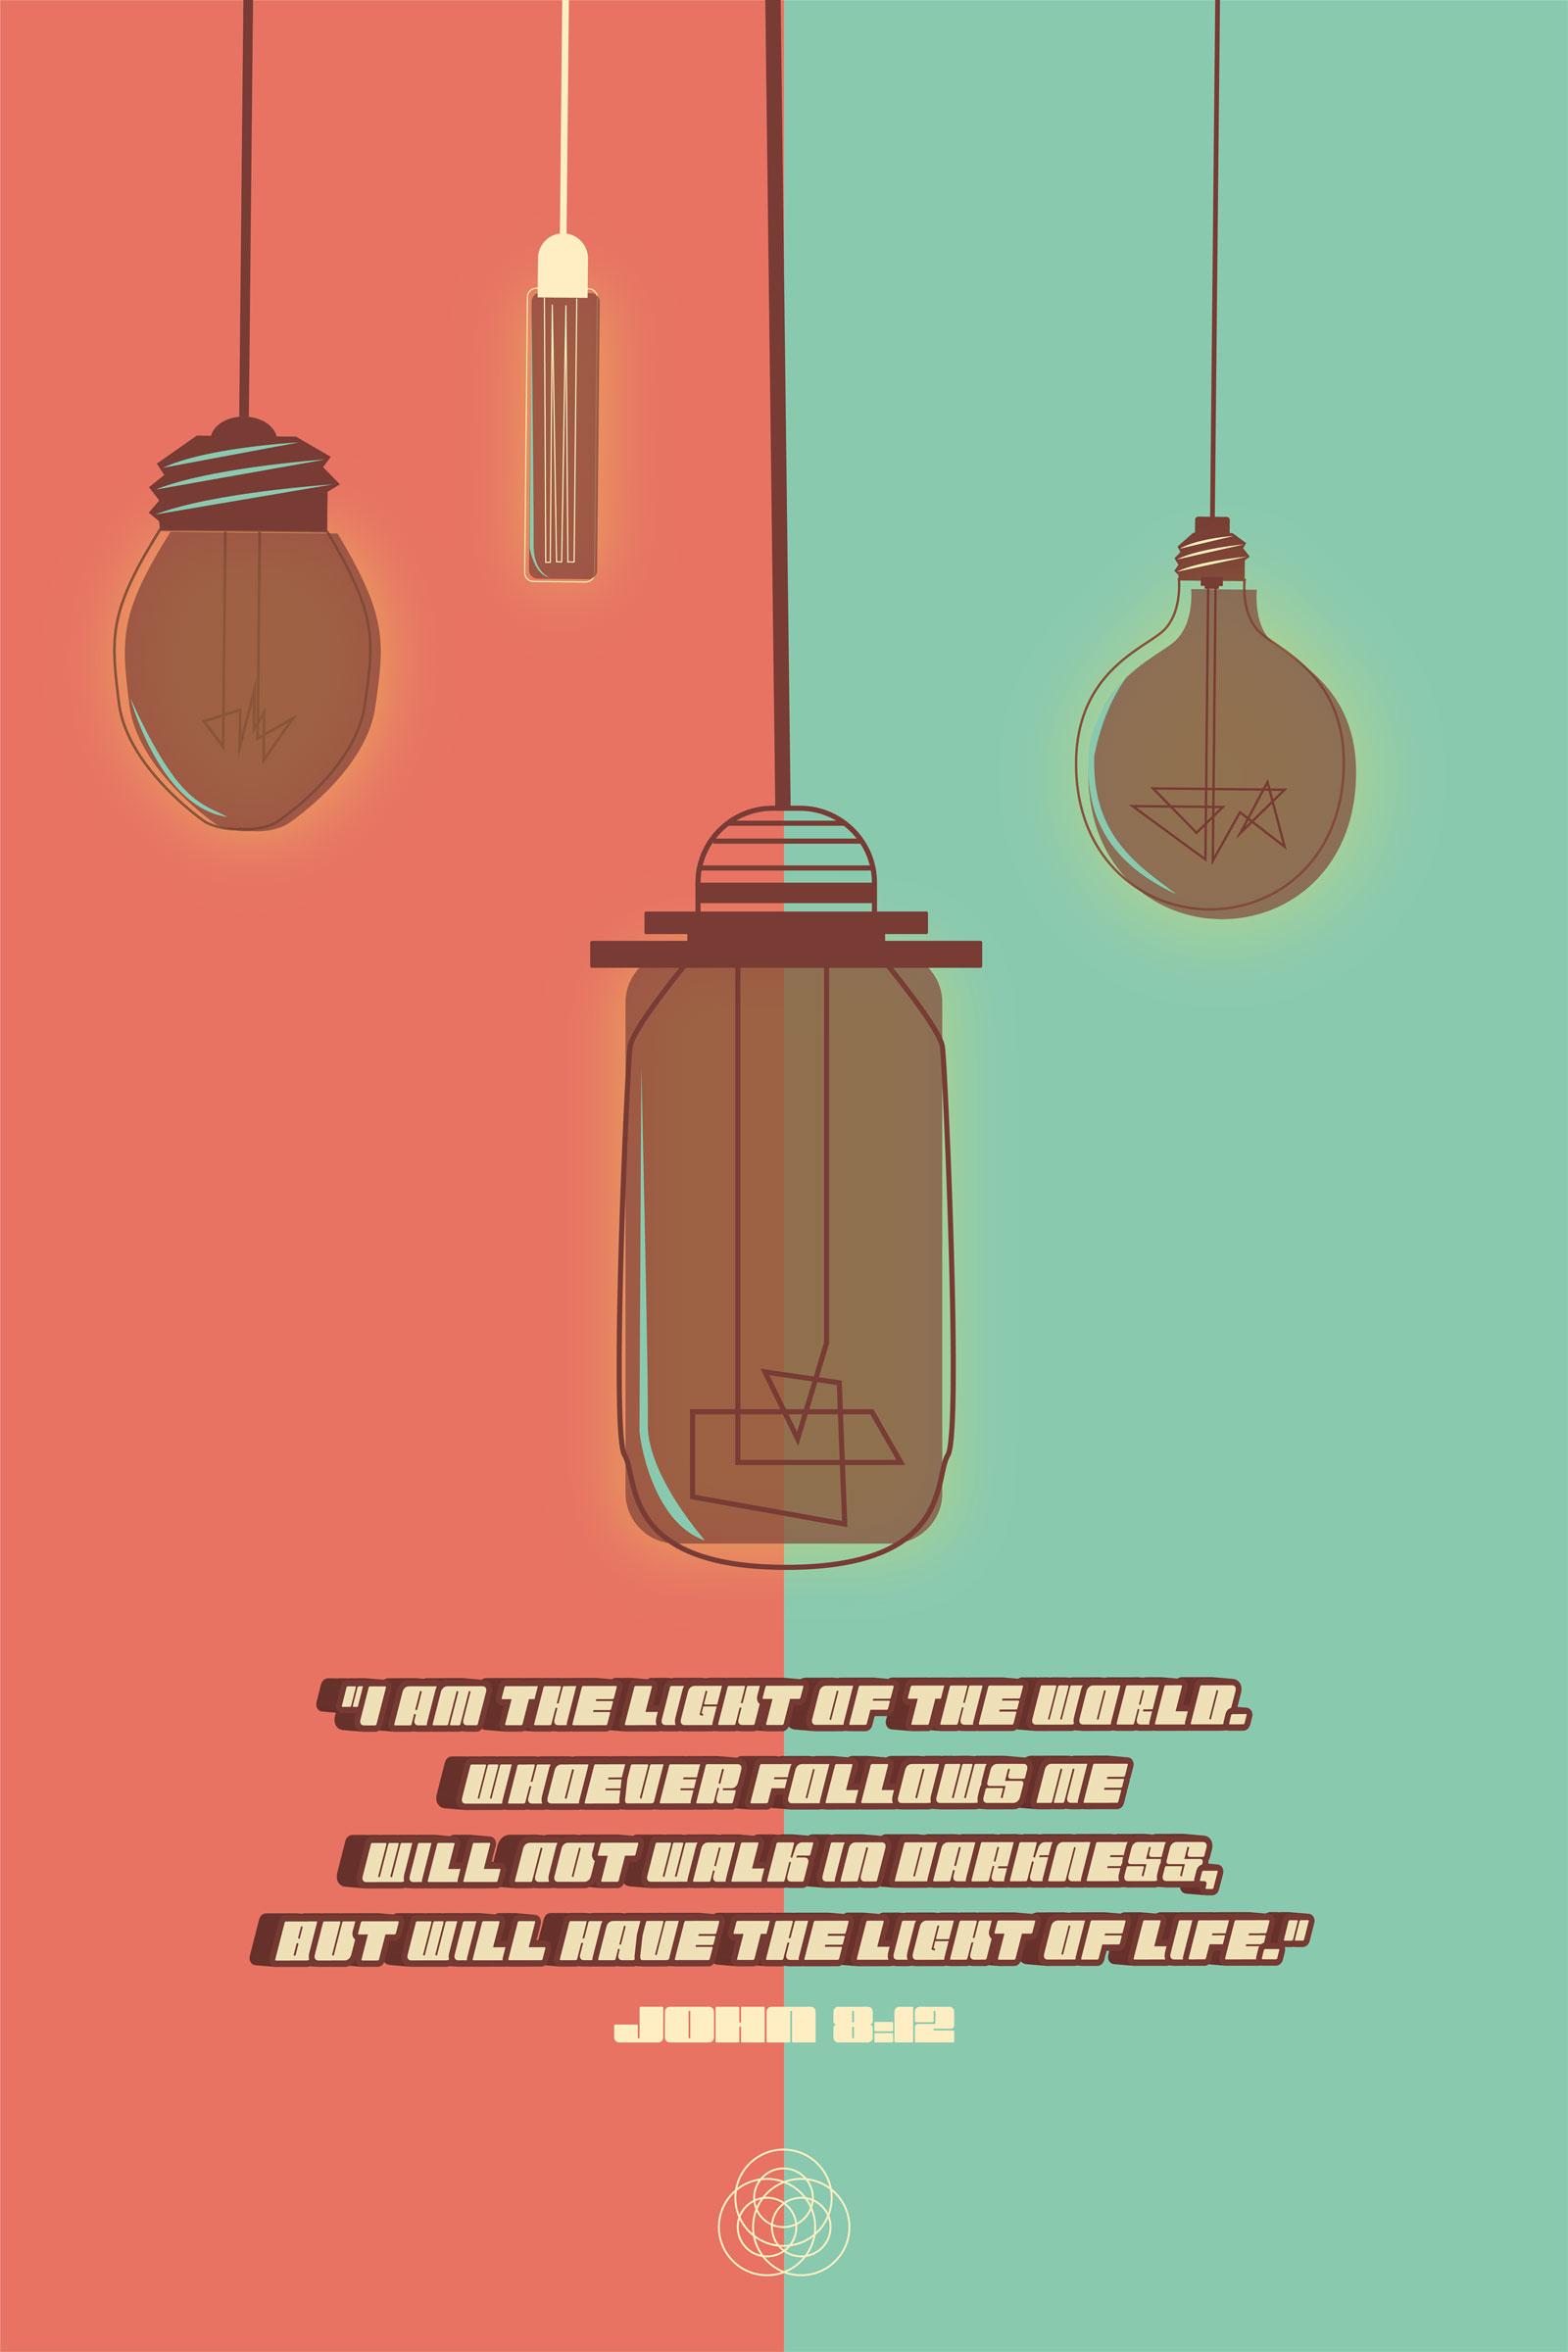 lightsee-believe-live.jpg